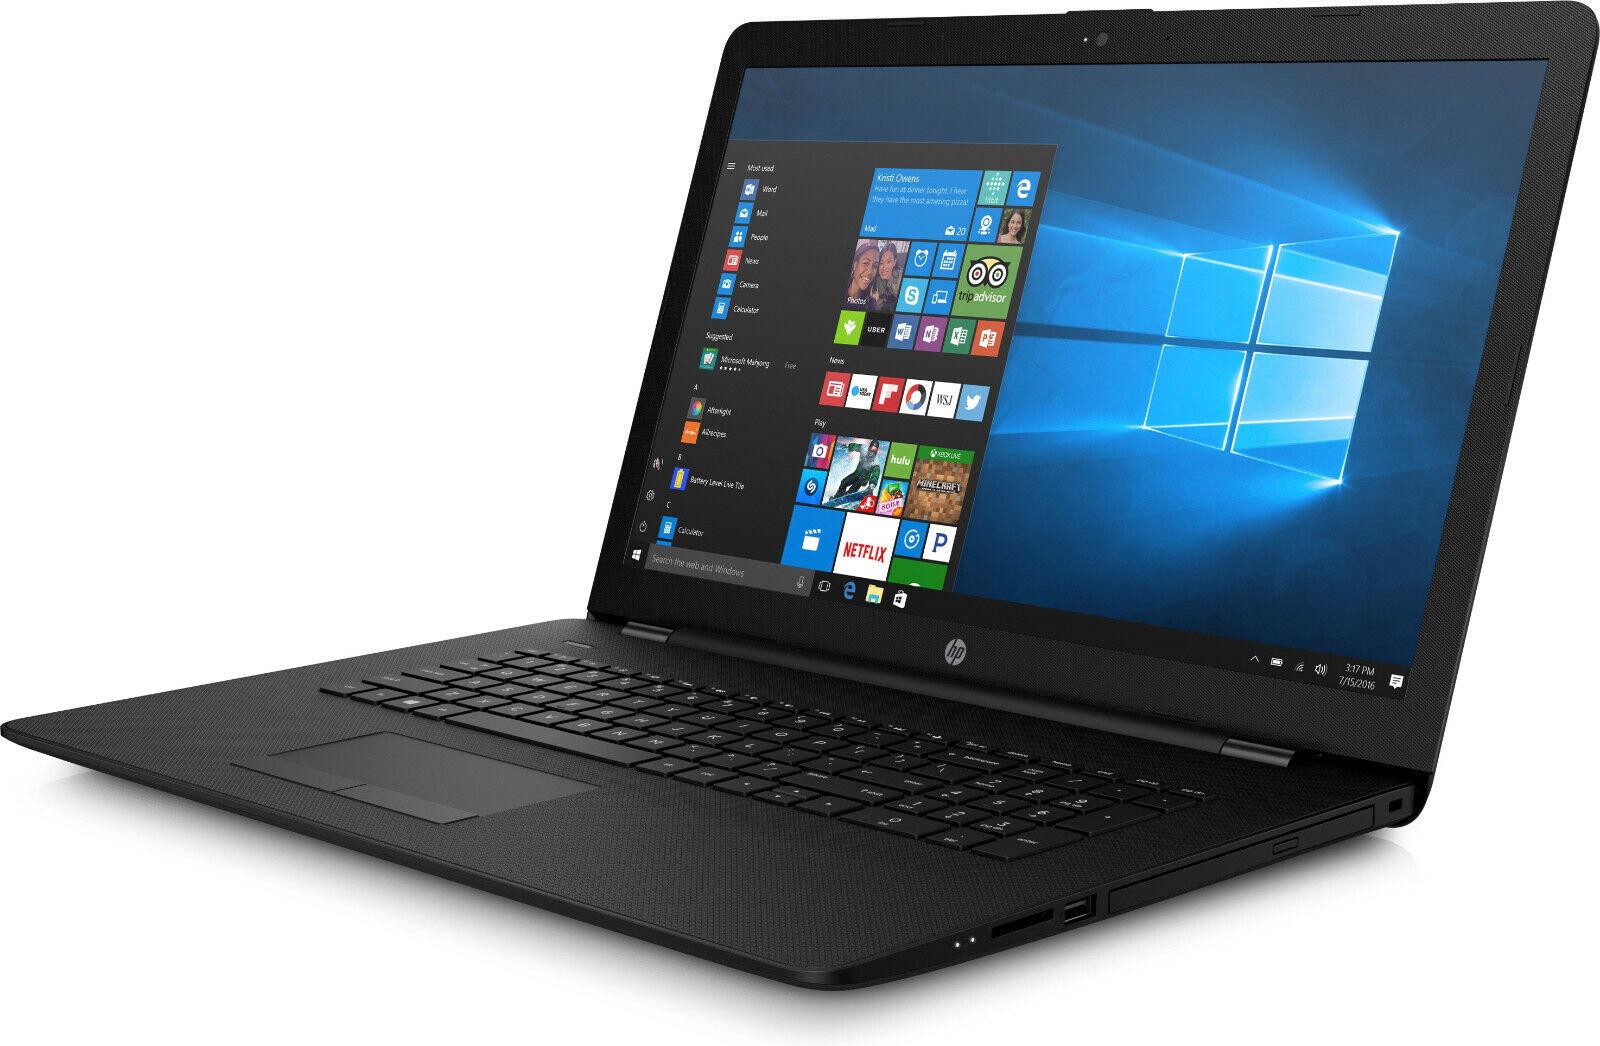 HP Notebook 17-BS547NG Pro DID 1 TB 1000 GB Läuft 17 Zoll Profi HP Laptop Tasche